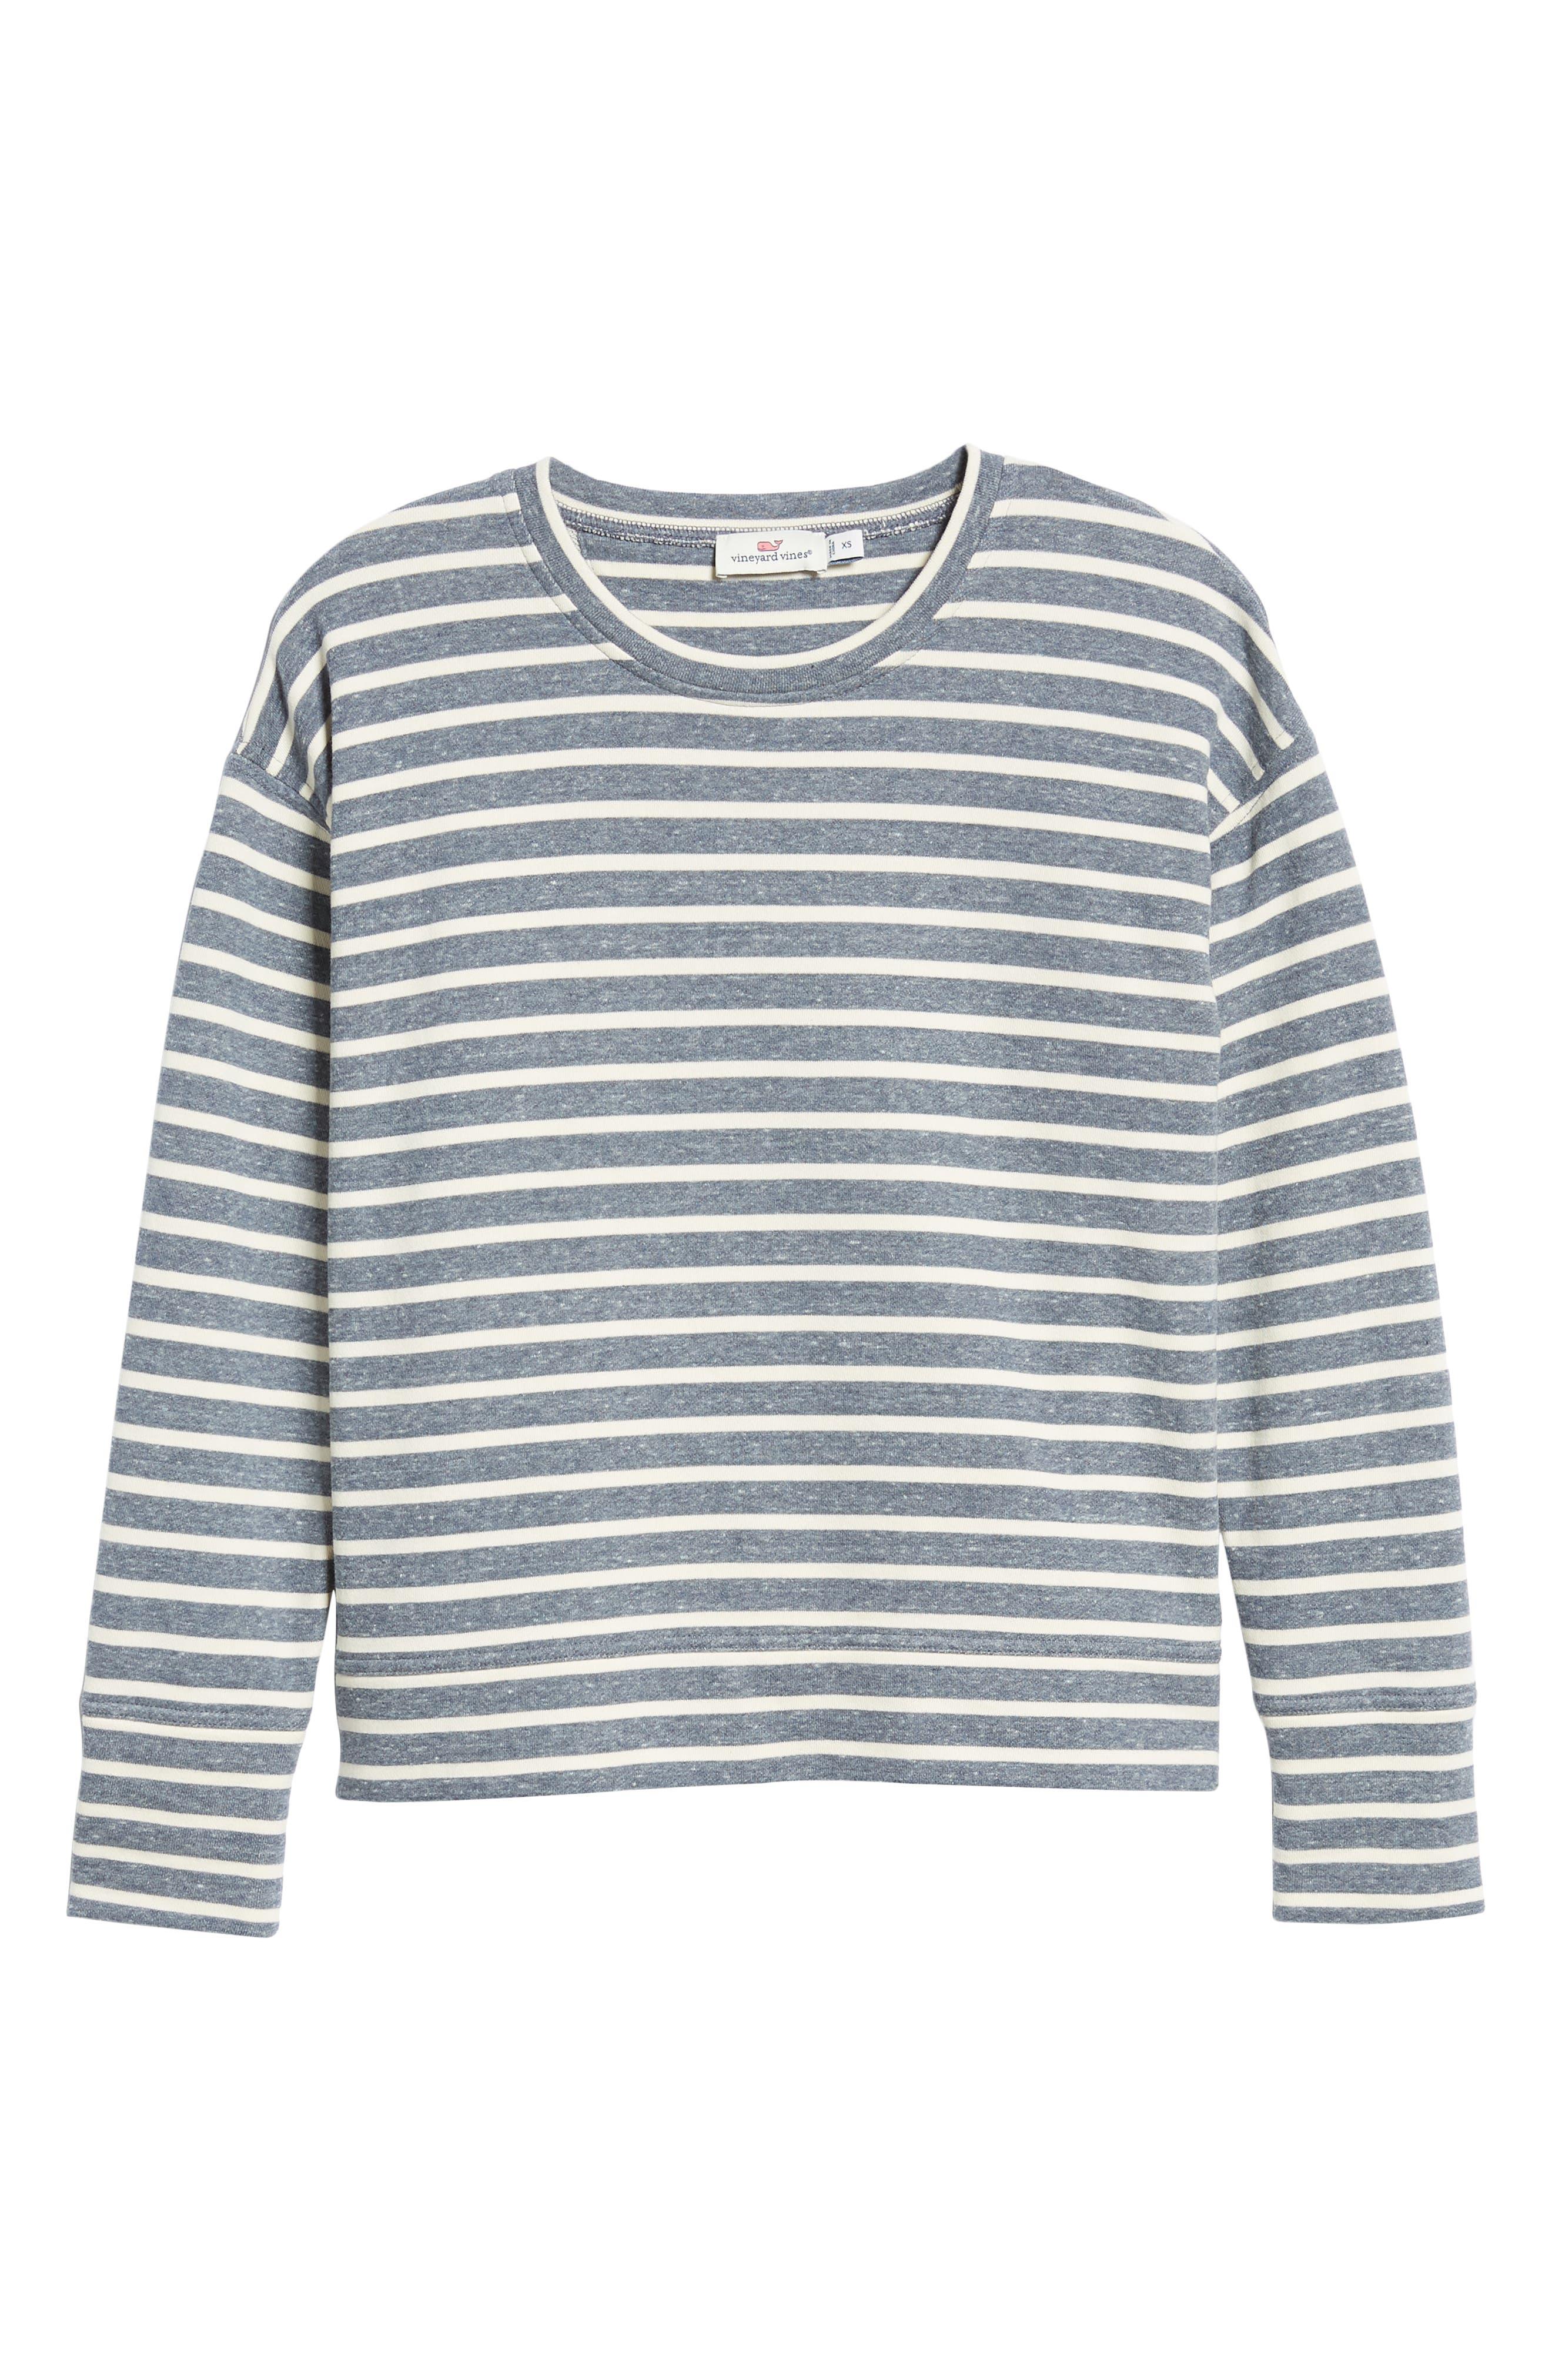 Stripe Sweatshirt,                             Alternate thumbnail 6, color,                             461